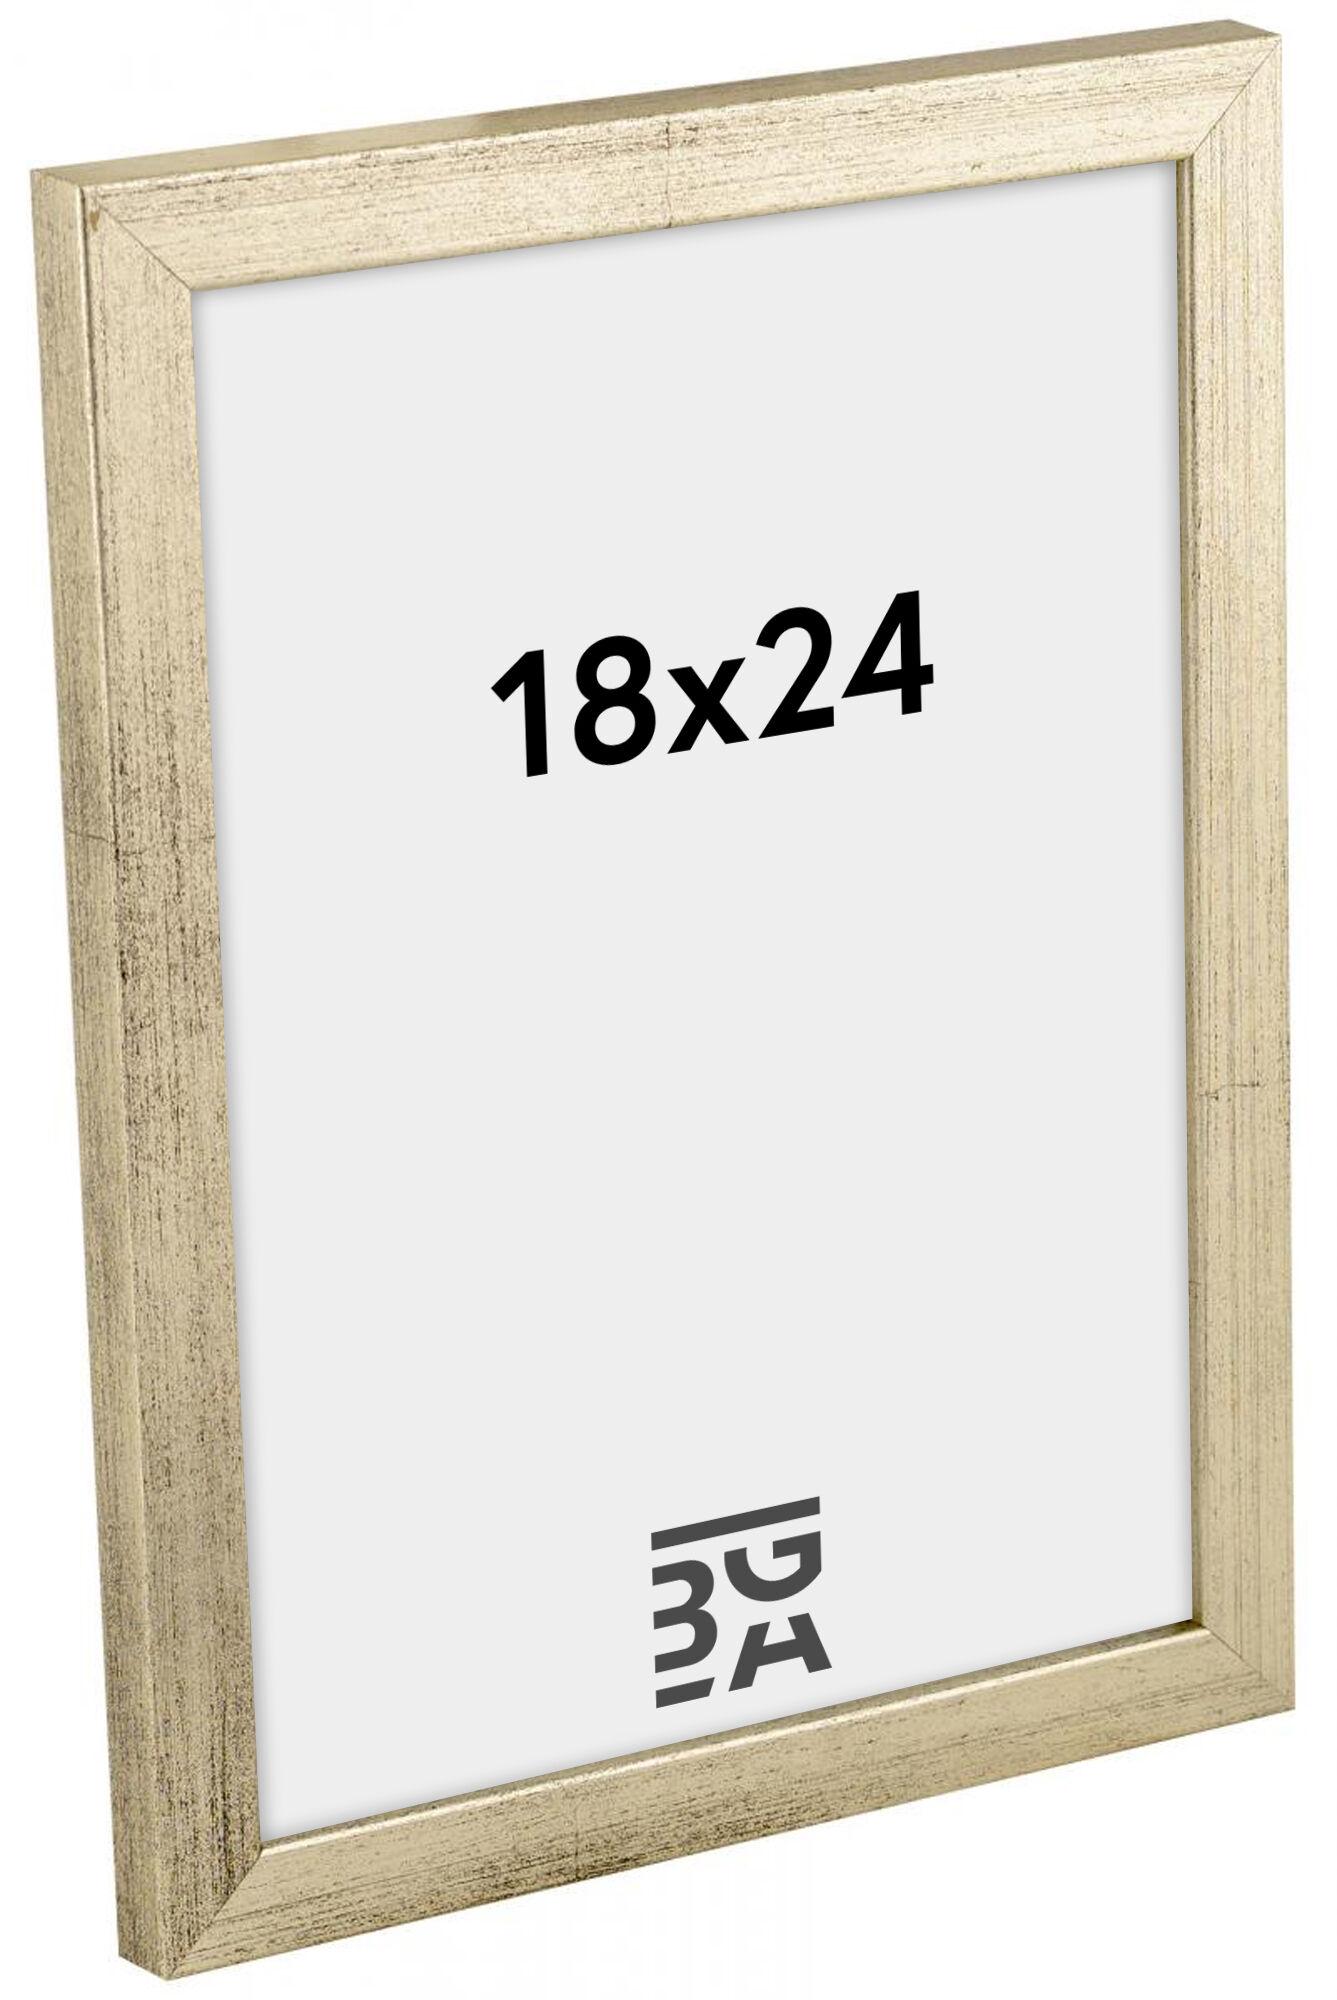 Estancia Galant Hopeanvärinen 18x24 cm